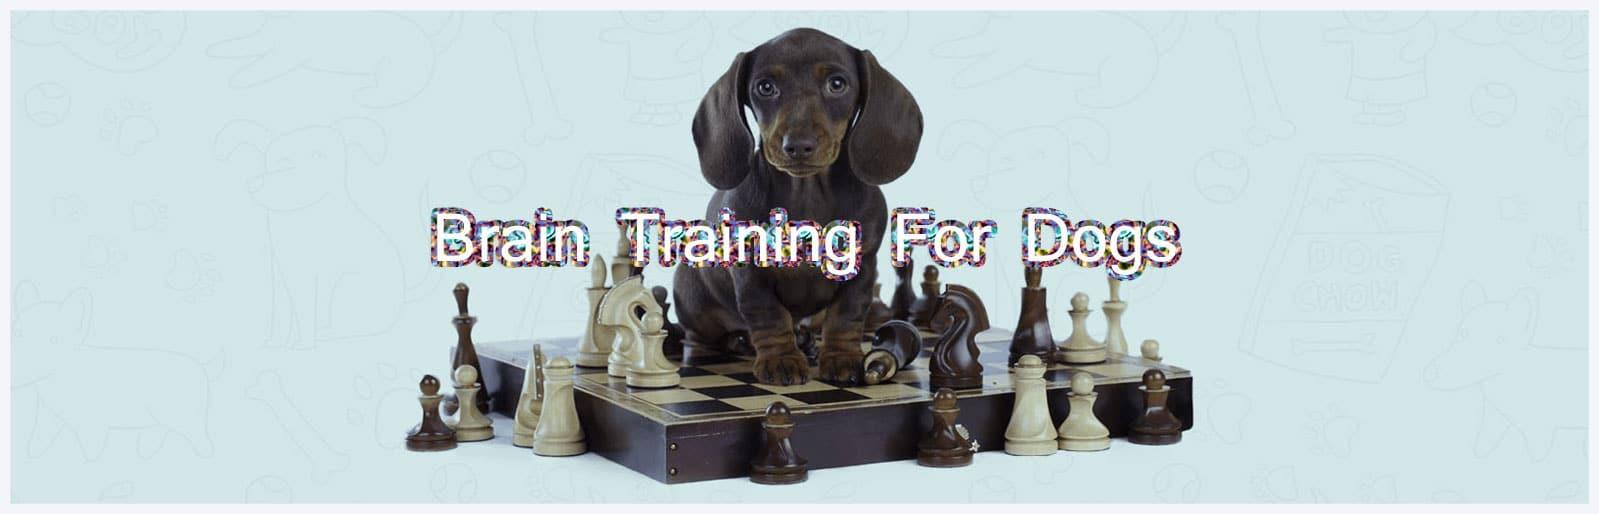 dog-training-header